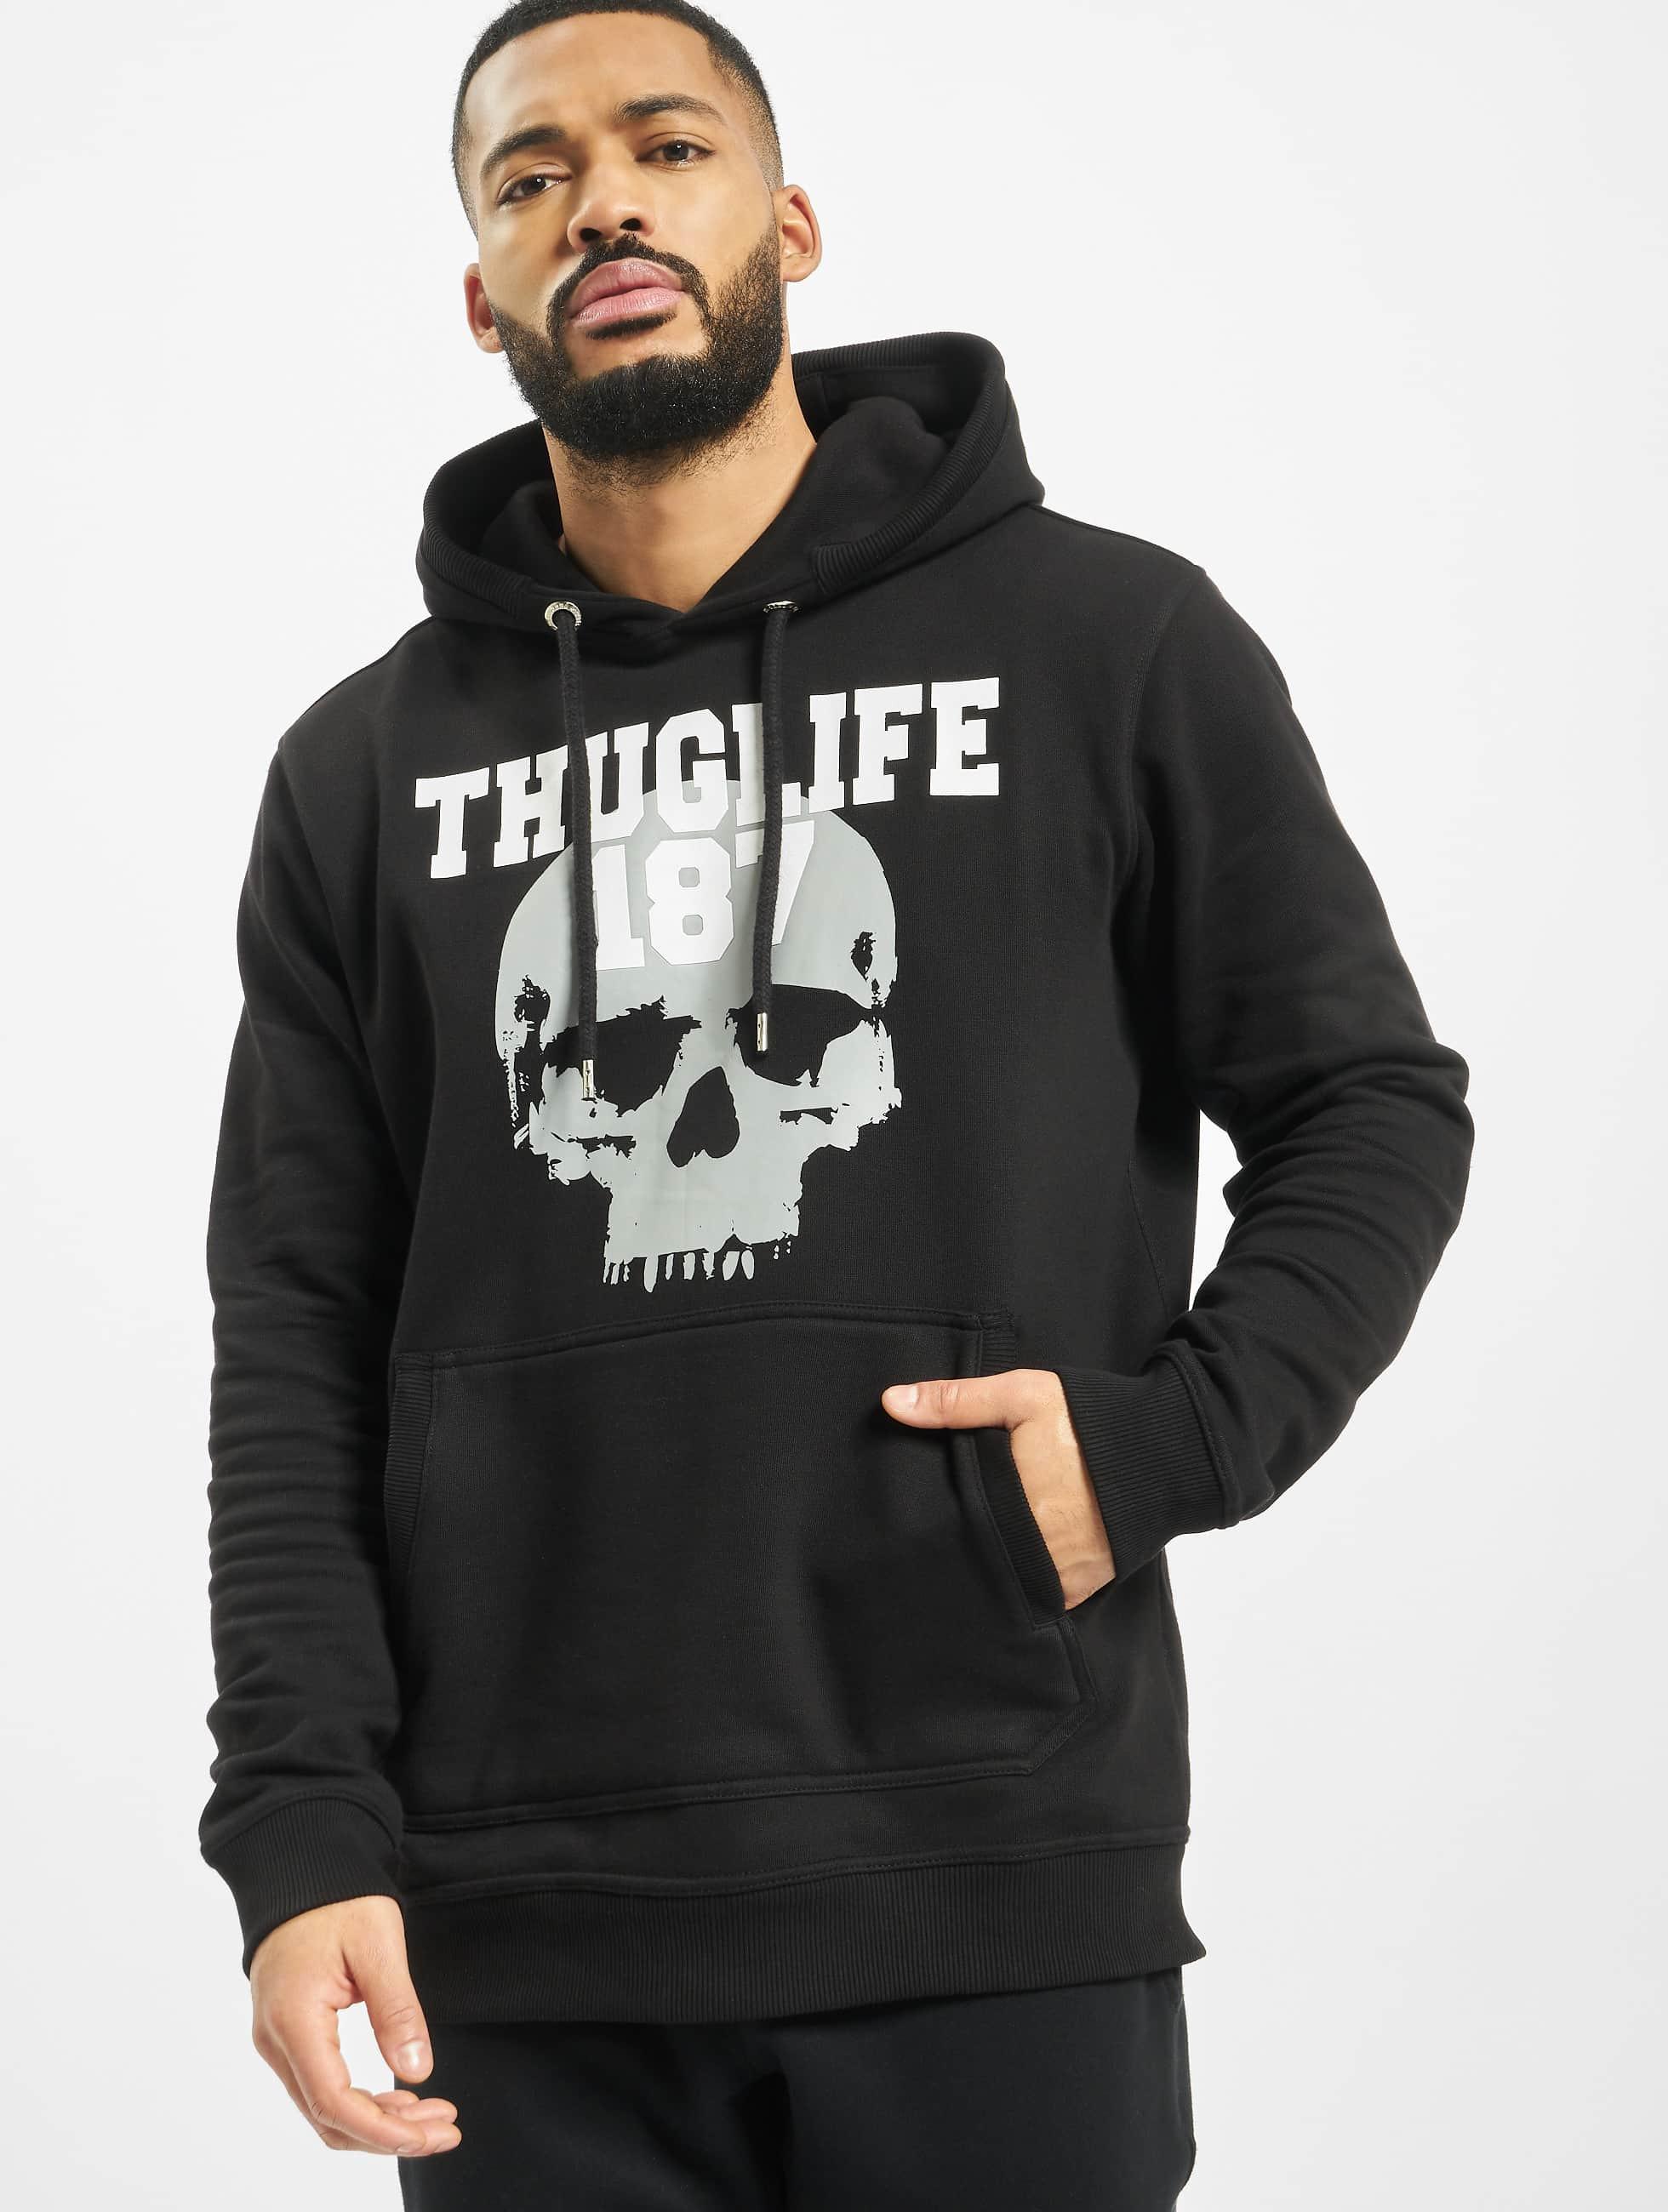 Thug Life / Hoodie Stay True in black XL